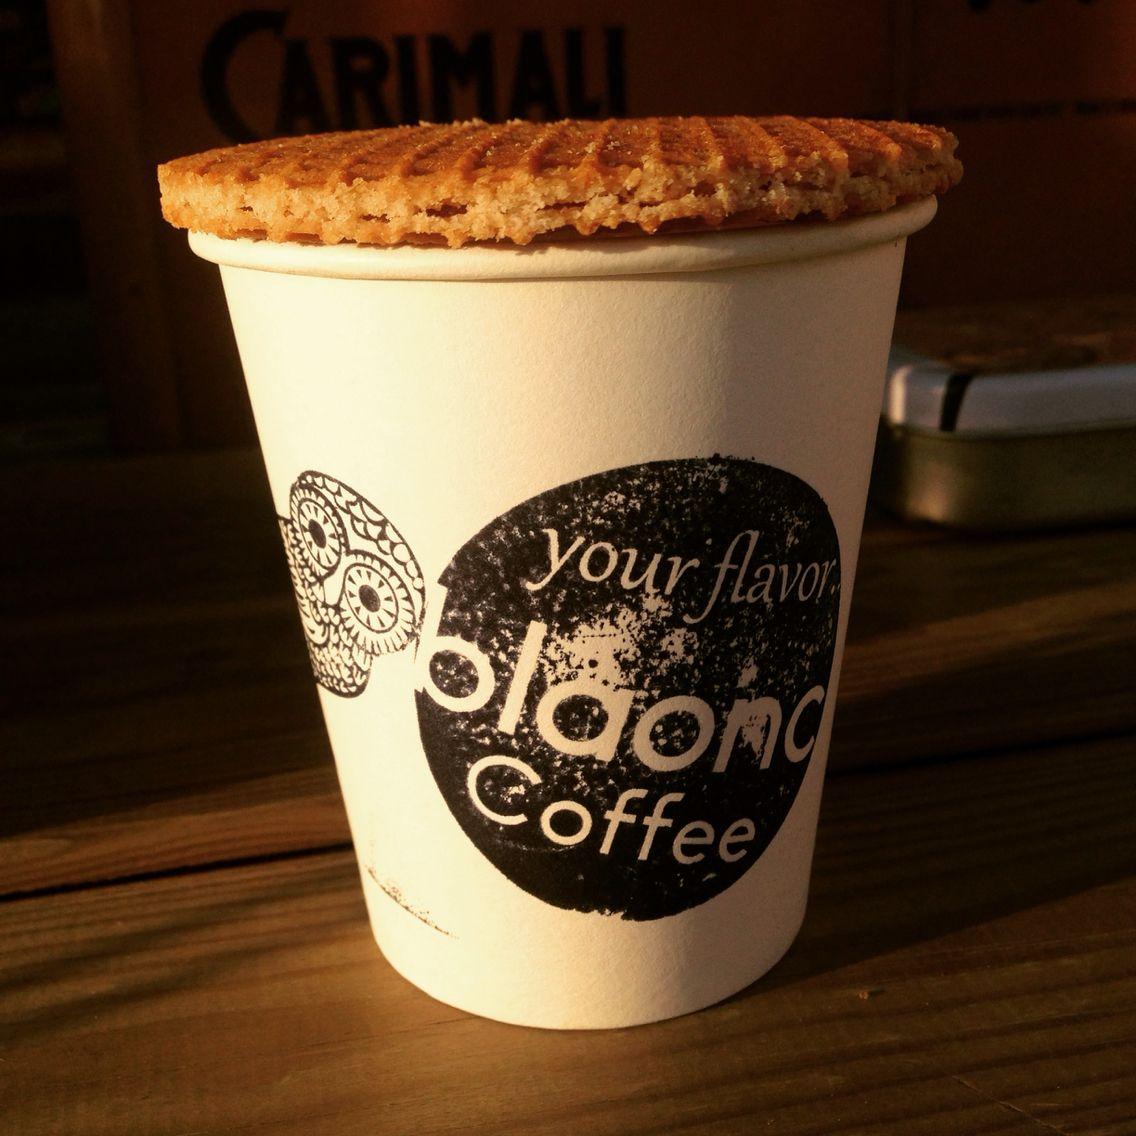 Blaonc coffee İstanbul